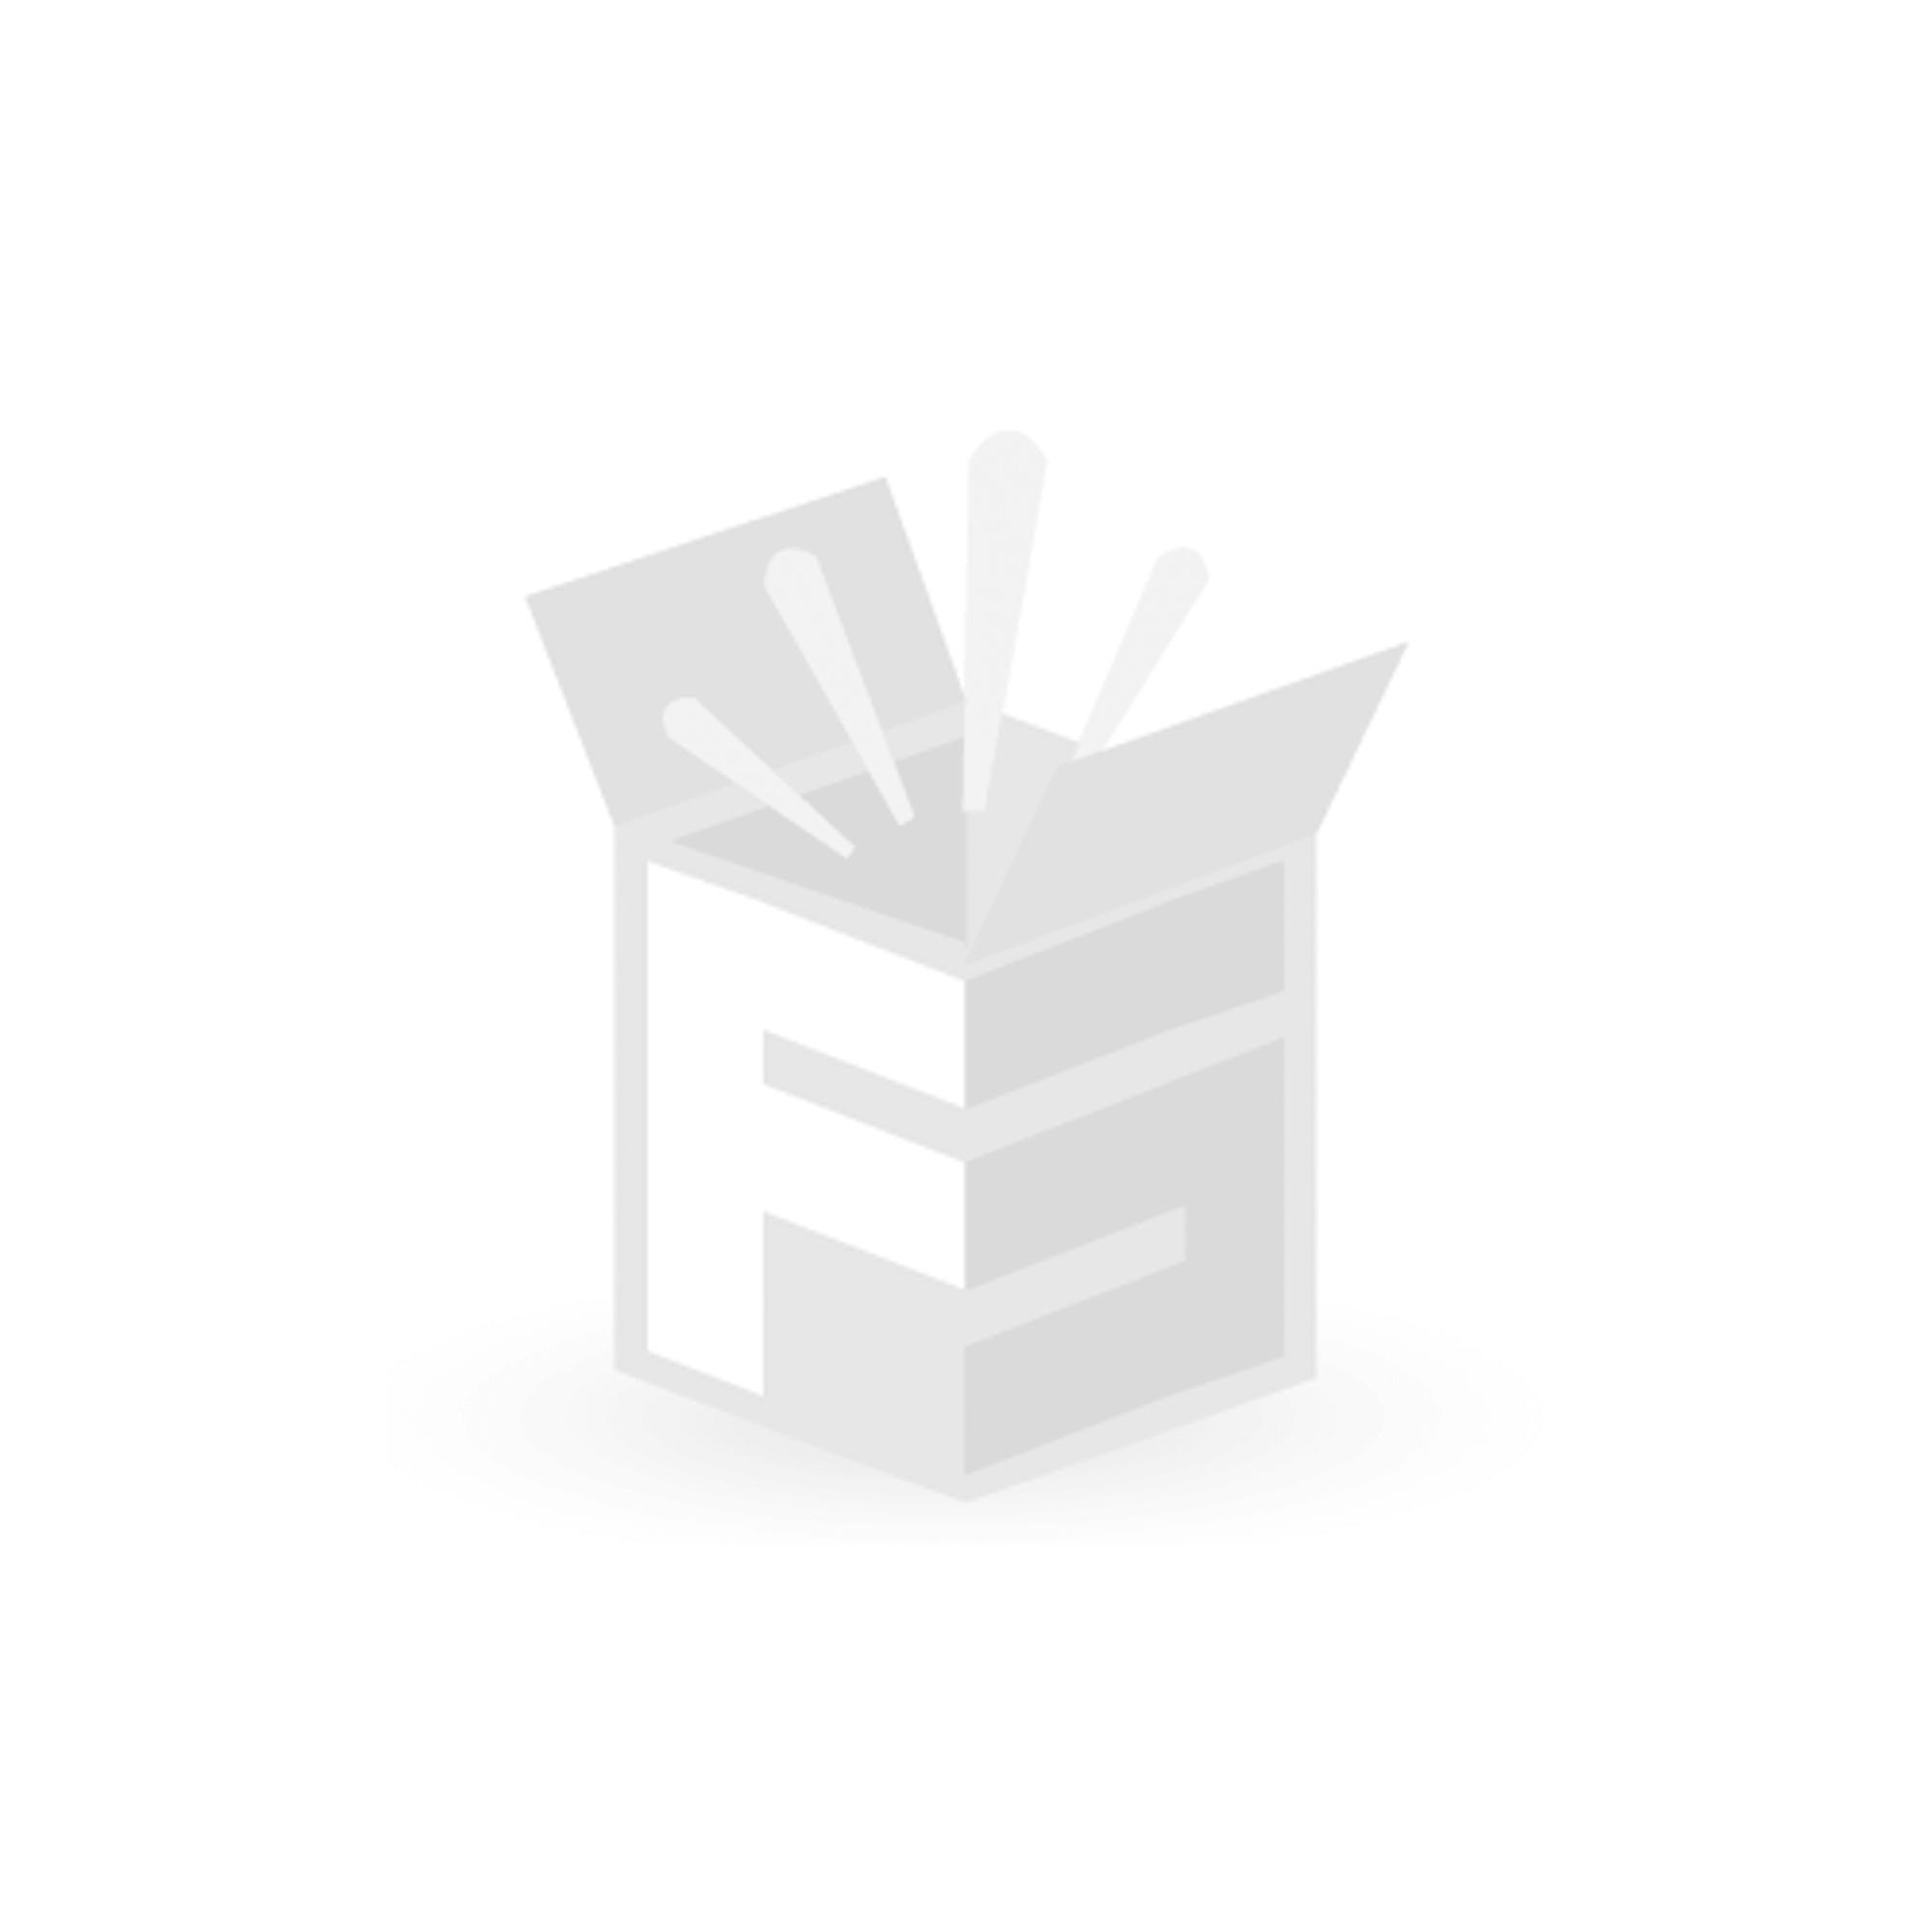 FS-STAR Weihnachtskugel LED silber, 10 Stück